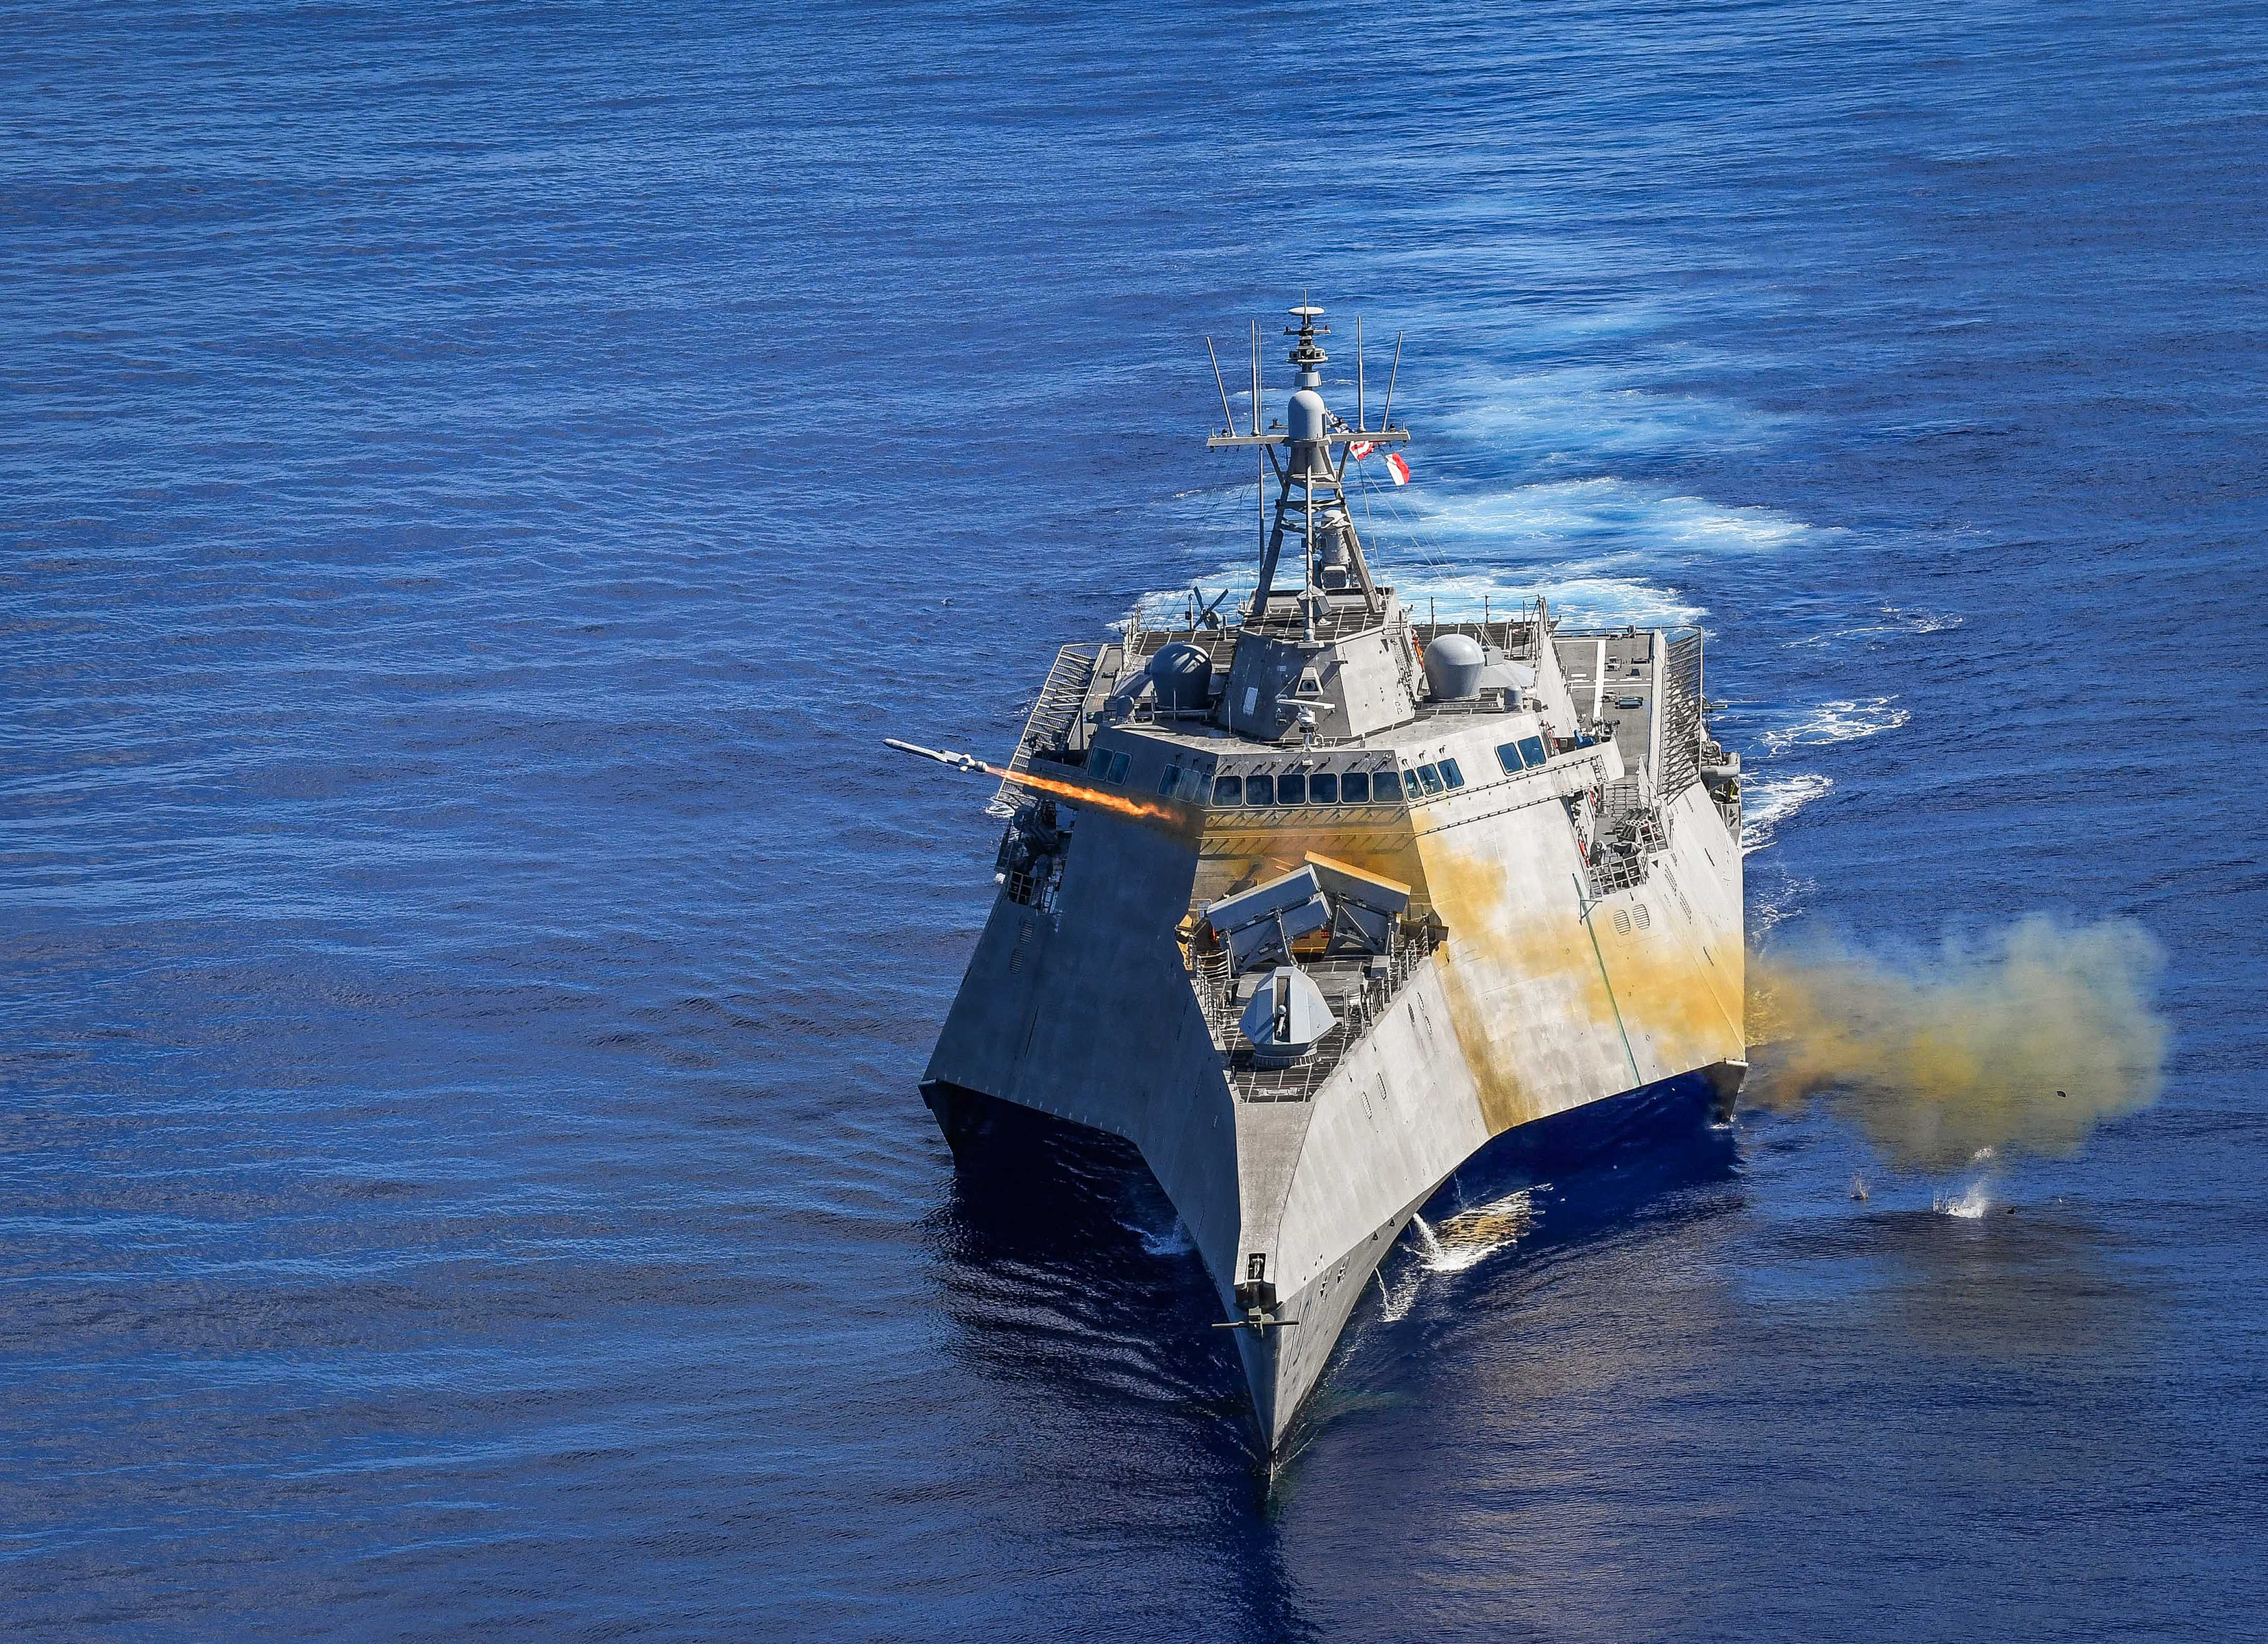 Ракета была запущена с корабля USS Gabrielle Giffords / фото navy.mil